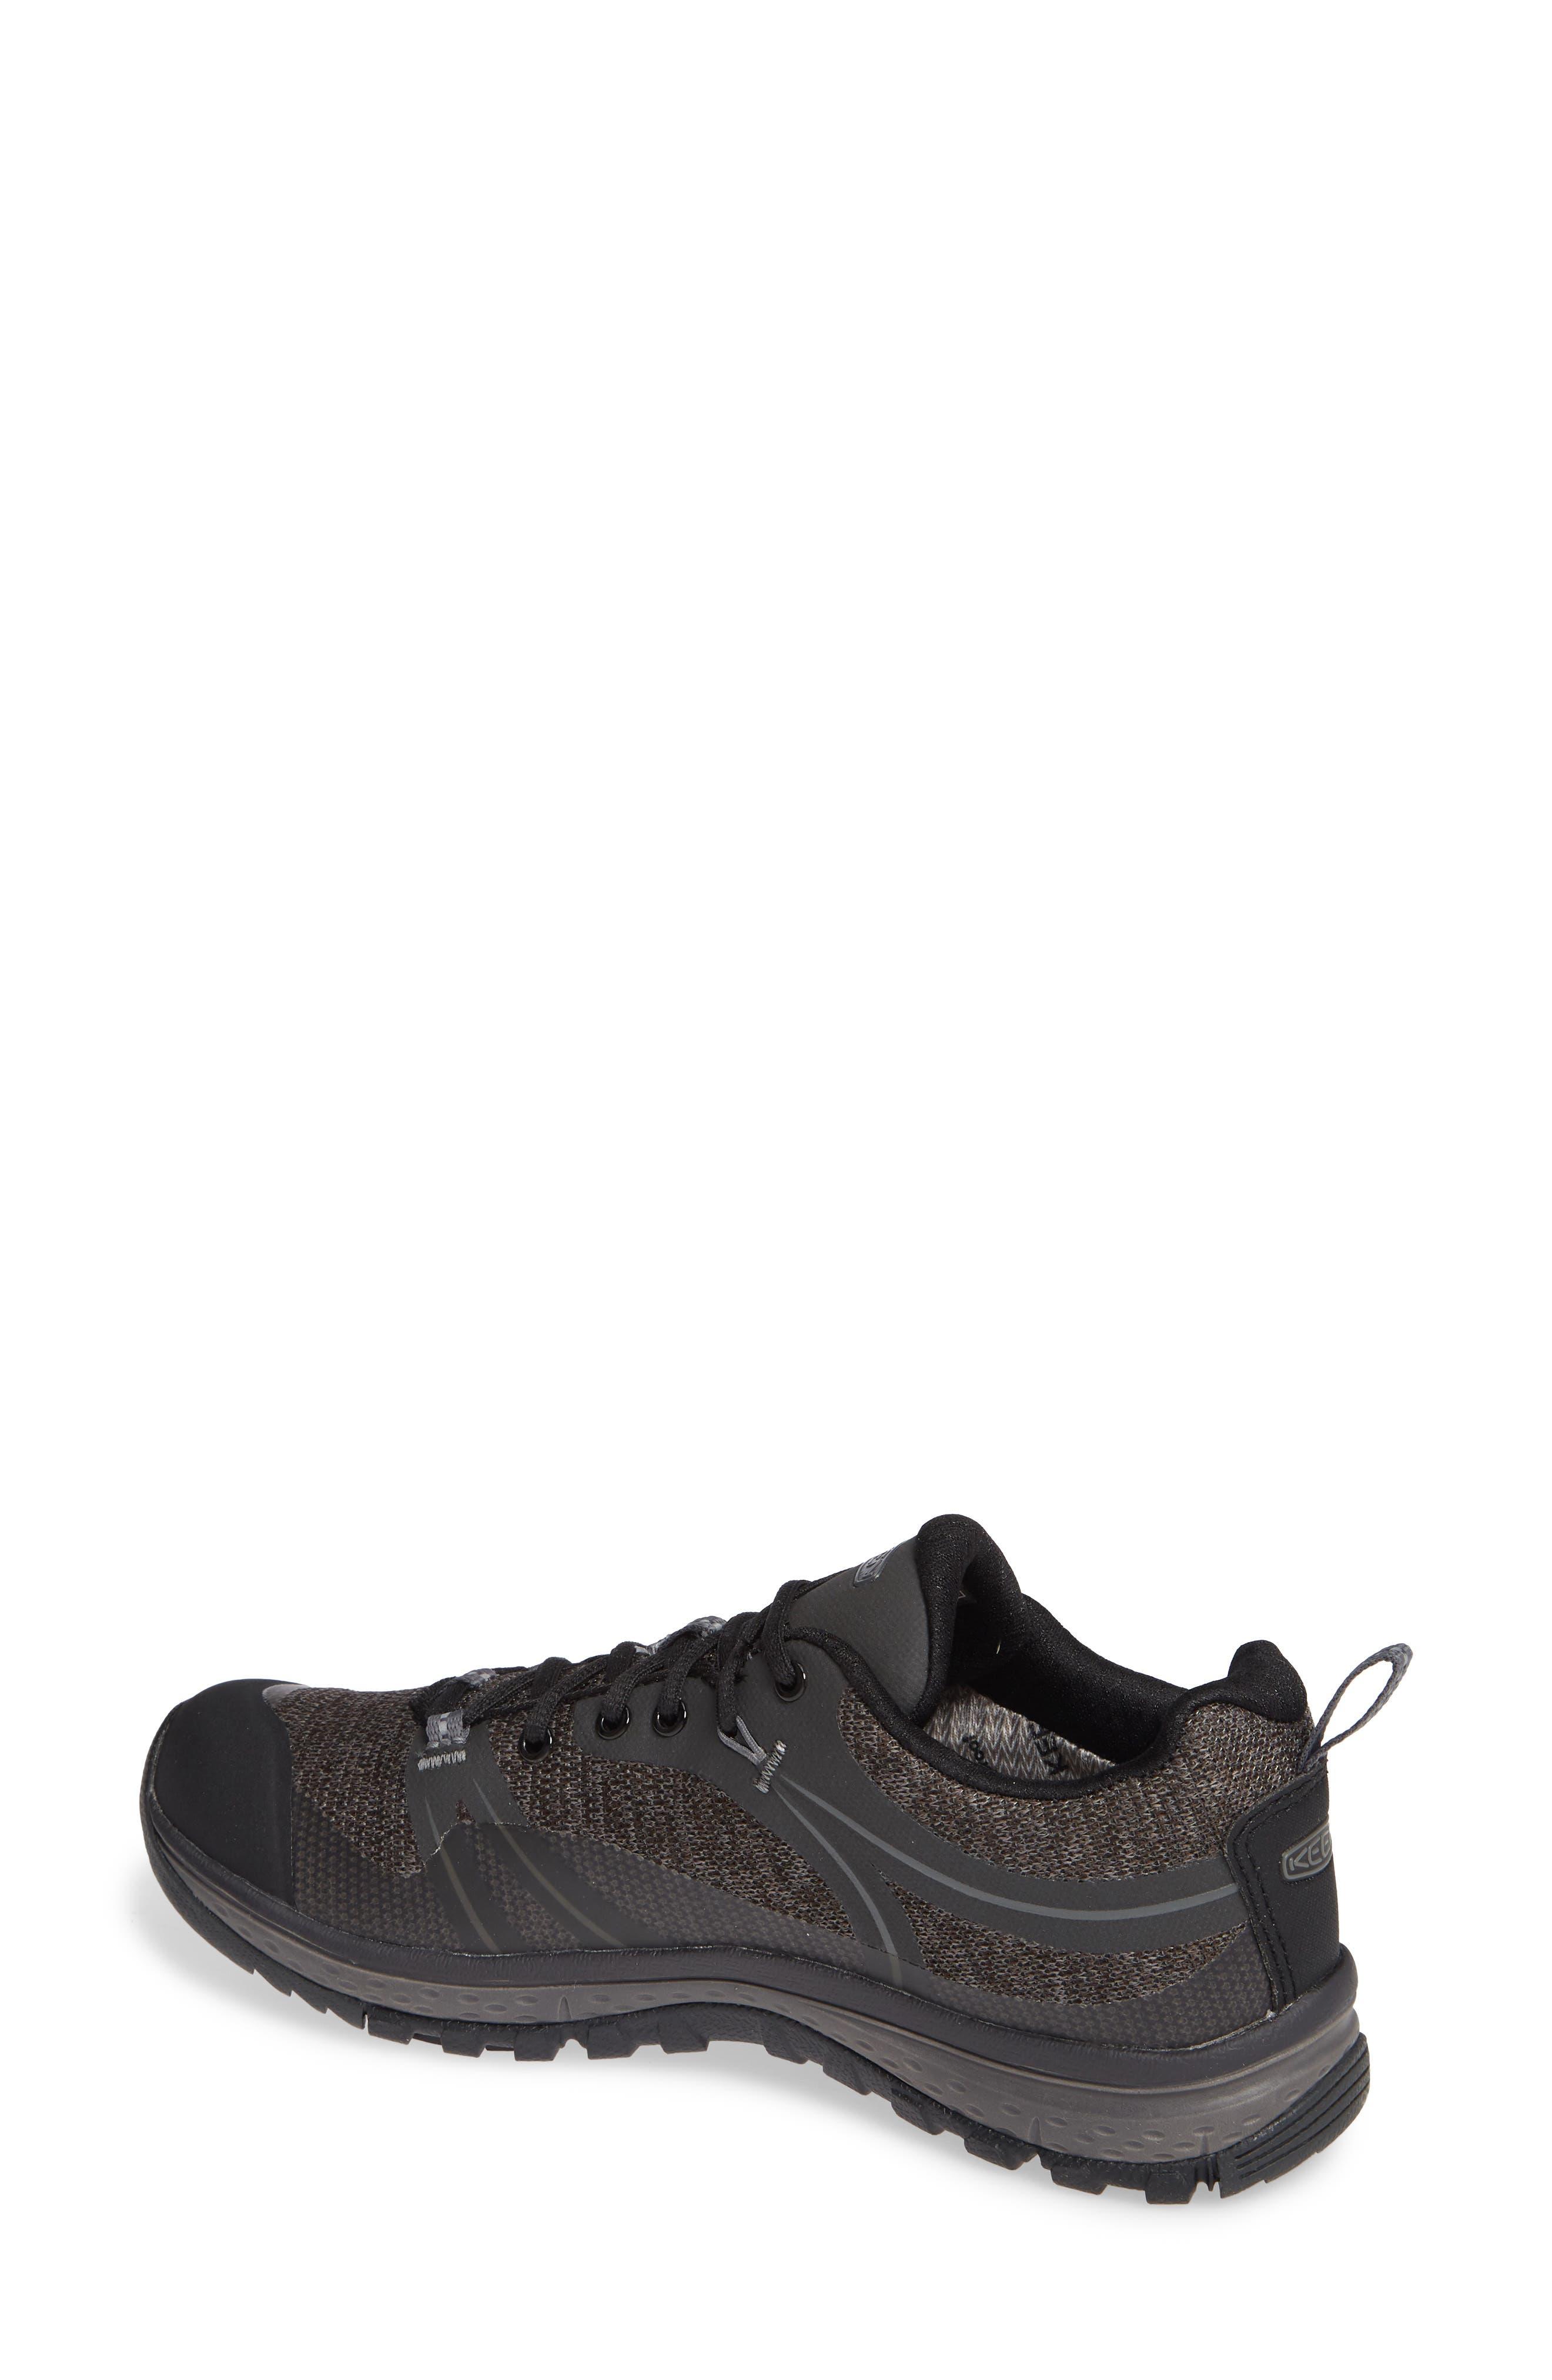 KEEN, Terradora Hiking Waterproof Sneaker, Alternate thumbnail 2, color, RAVEN/ GARGOYLE